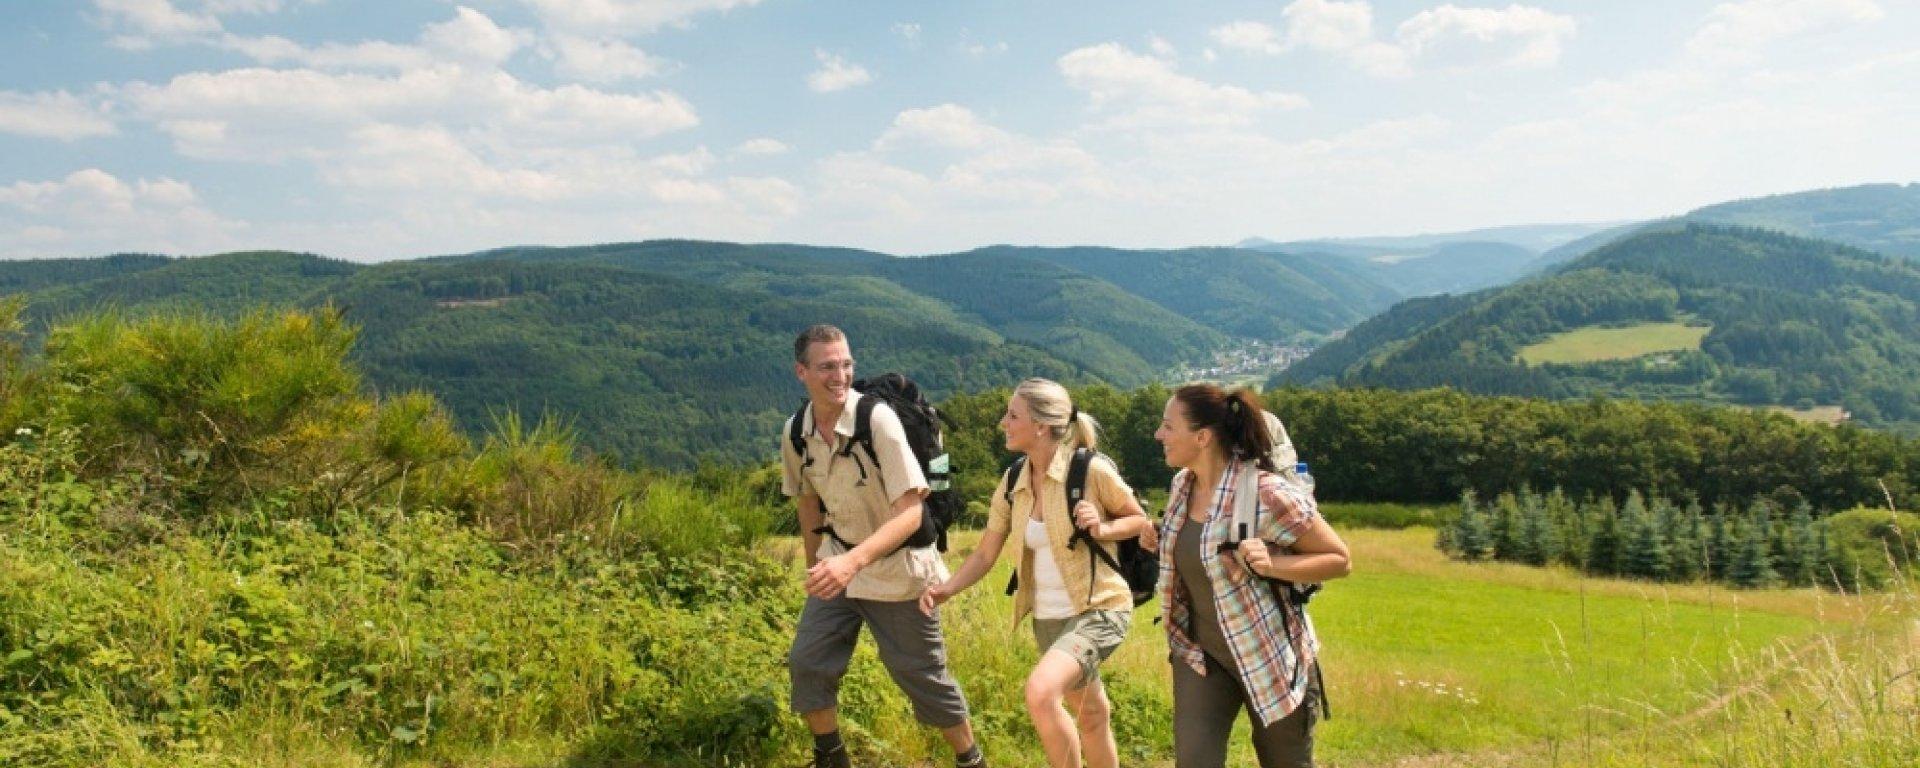 Wanderfreude, 7 Nächte